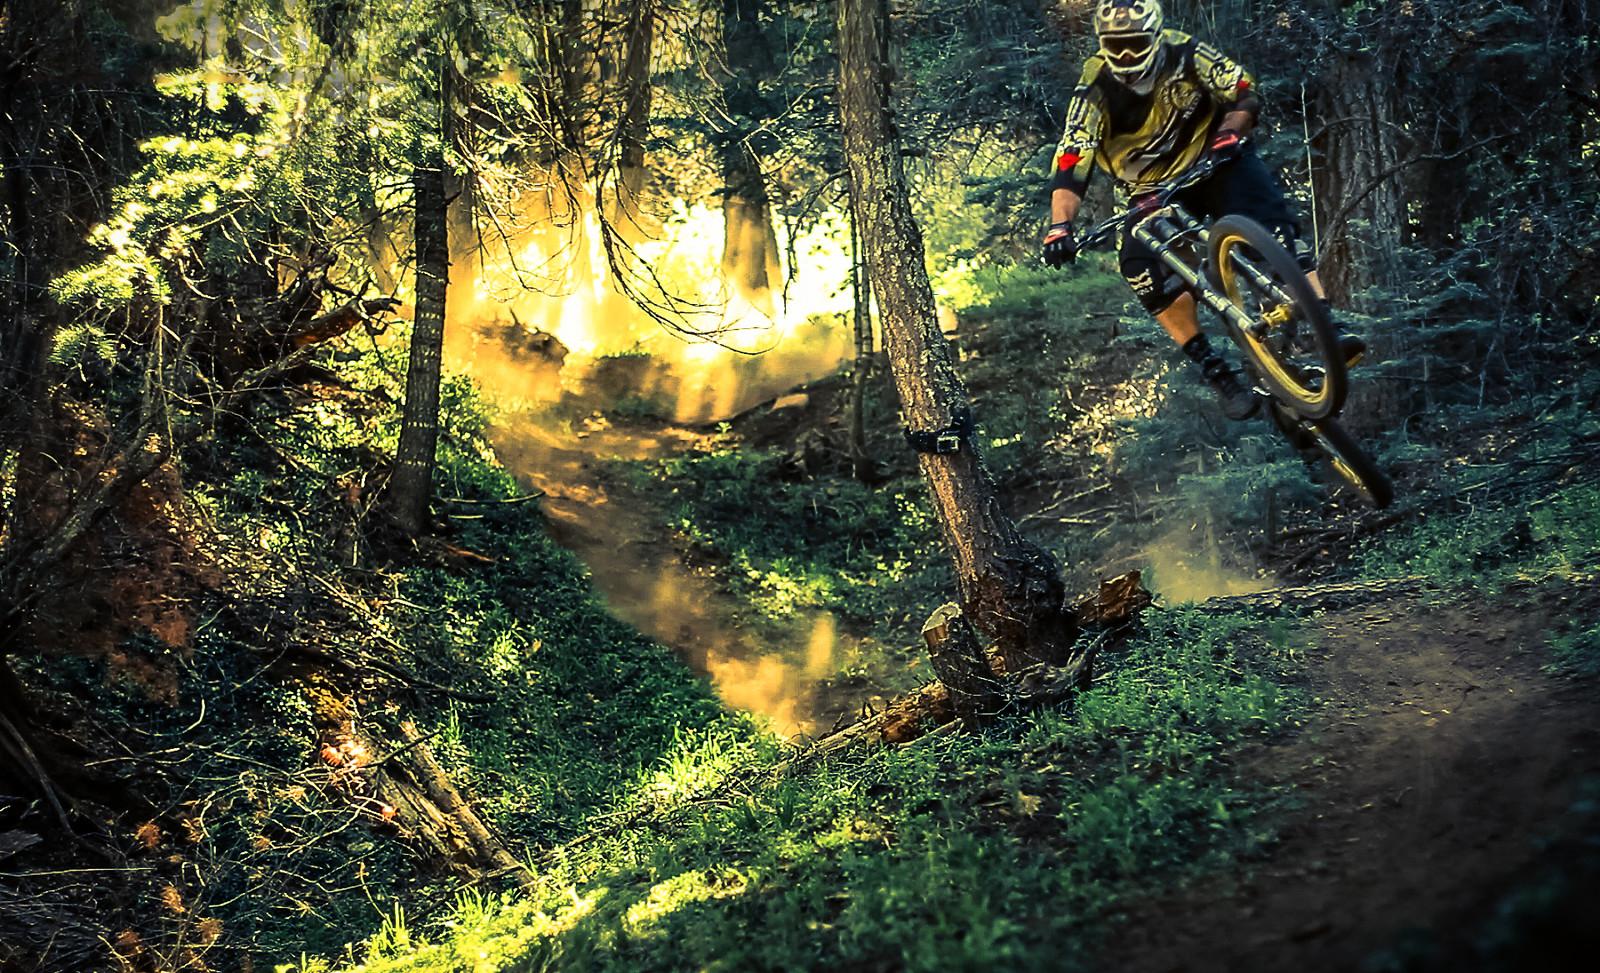 Downhill Season - jerryhazard - Mountain Biking Pictures - Vital MTB